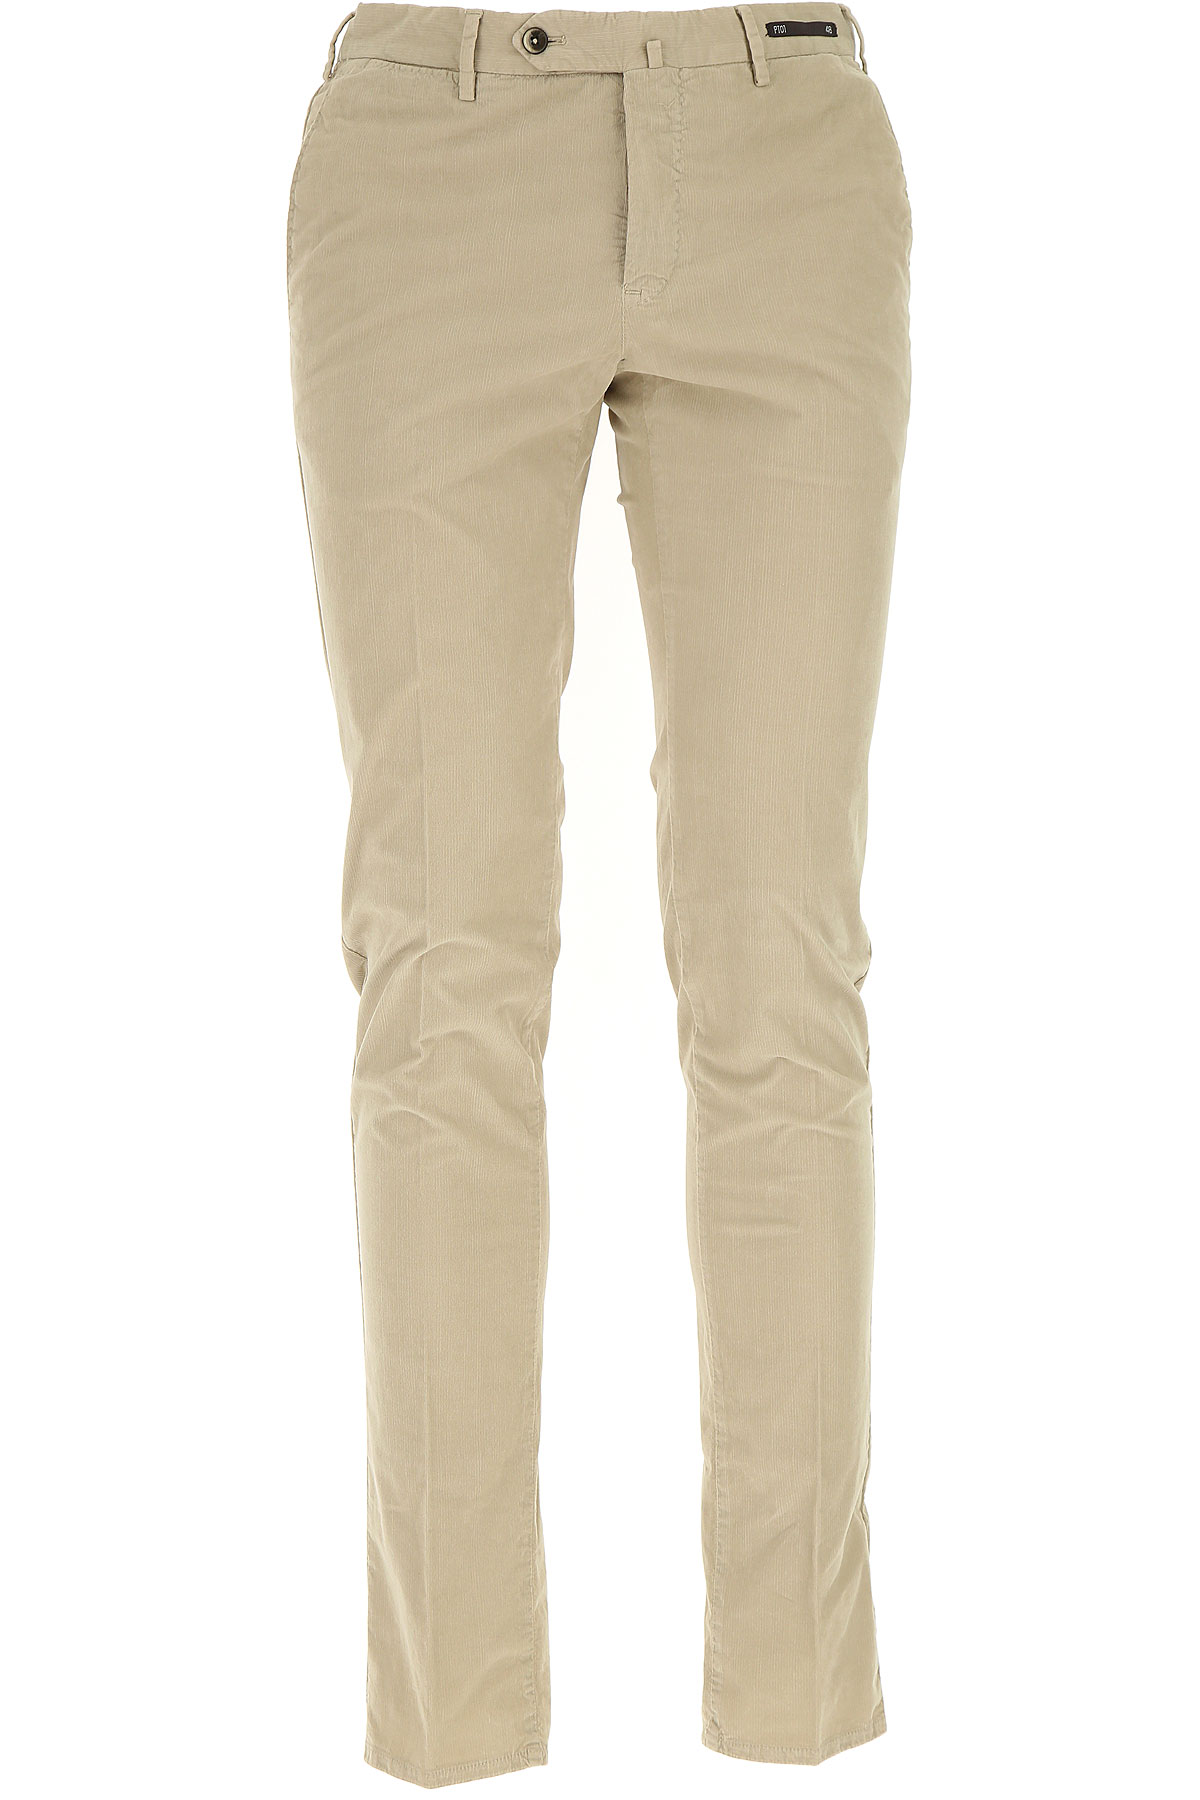 Image of PT01 Pants for Men, Beige, Cotton, 2017, 30 31 32 33